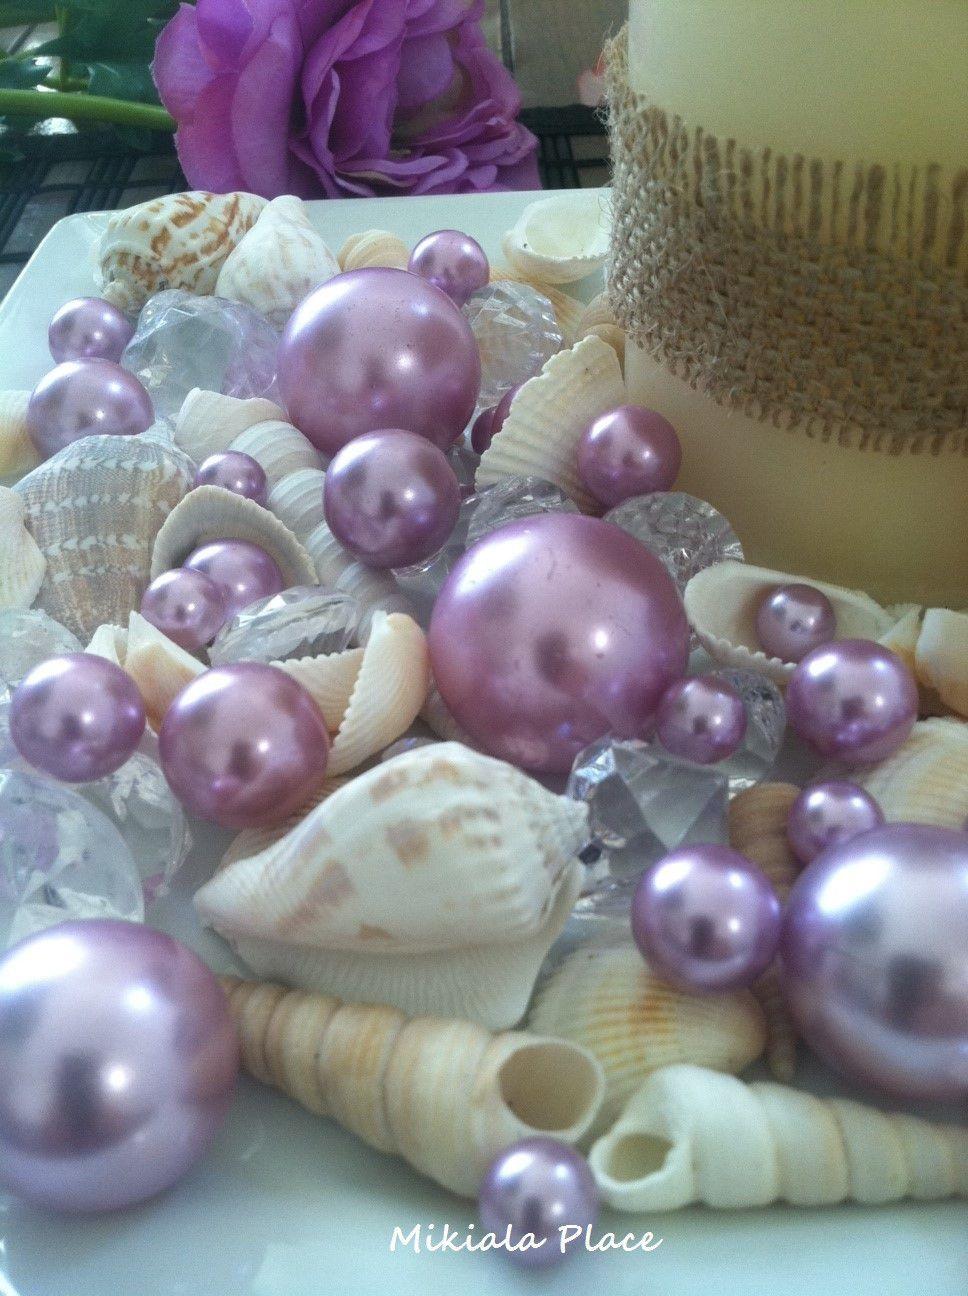 Mix seashells diamonds pearl vase bowl fillers table mix seashells diamonds pearl vase bowl fillers table scatters coastal decor wedding beach theme decors reviewsmspy